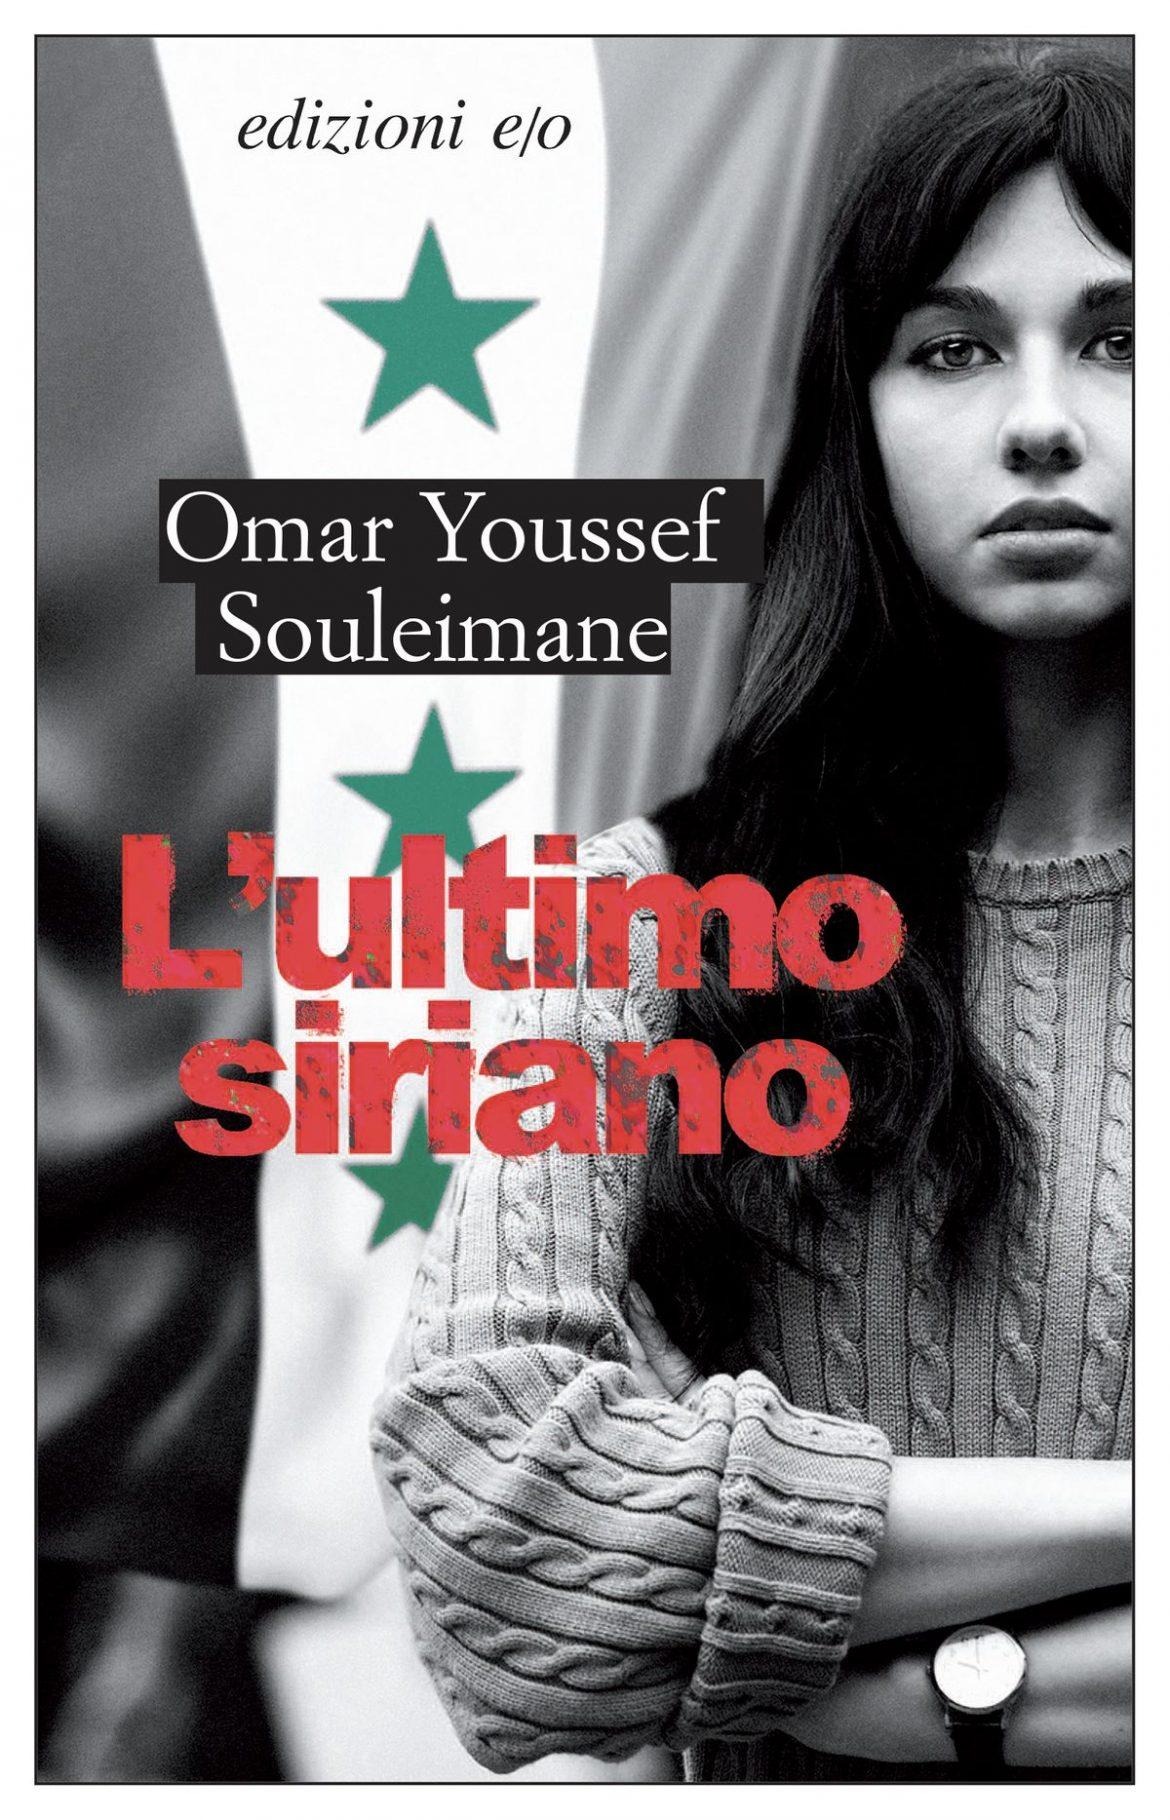 Recensione di L' Ultimo Siriano – Omar Youssef Souleimane